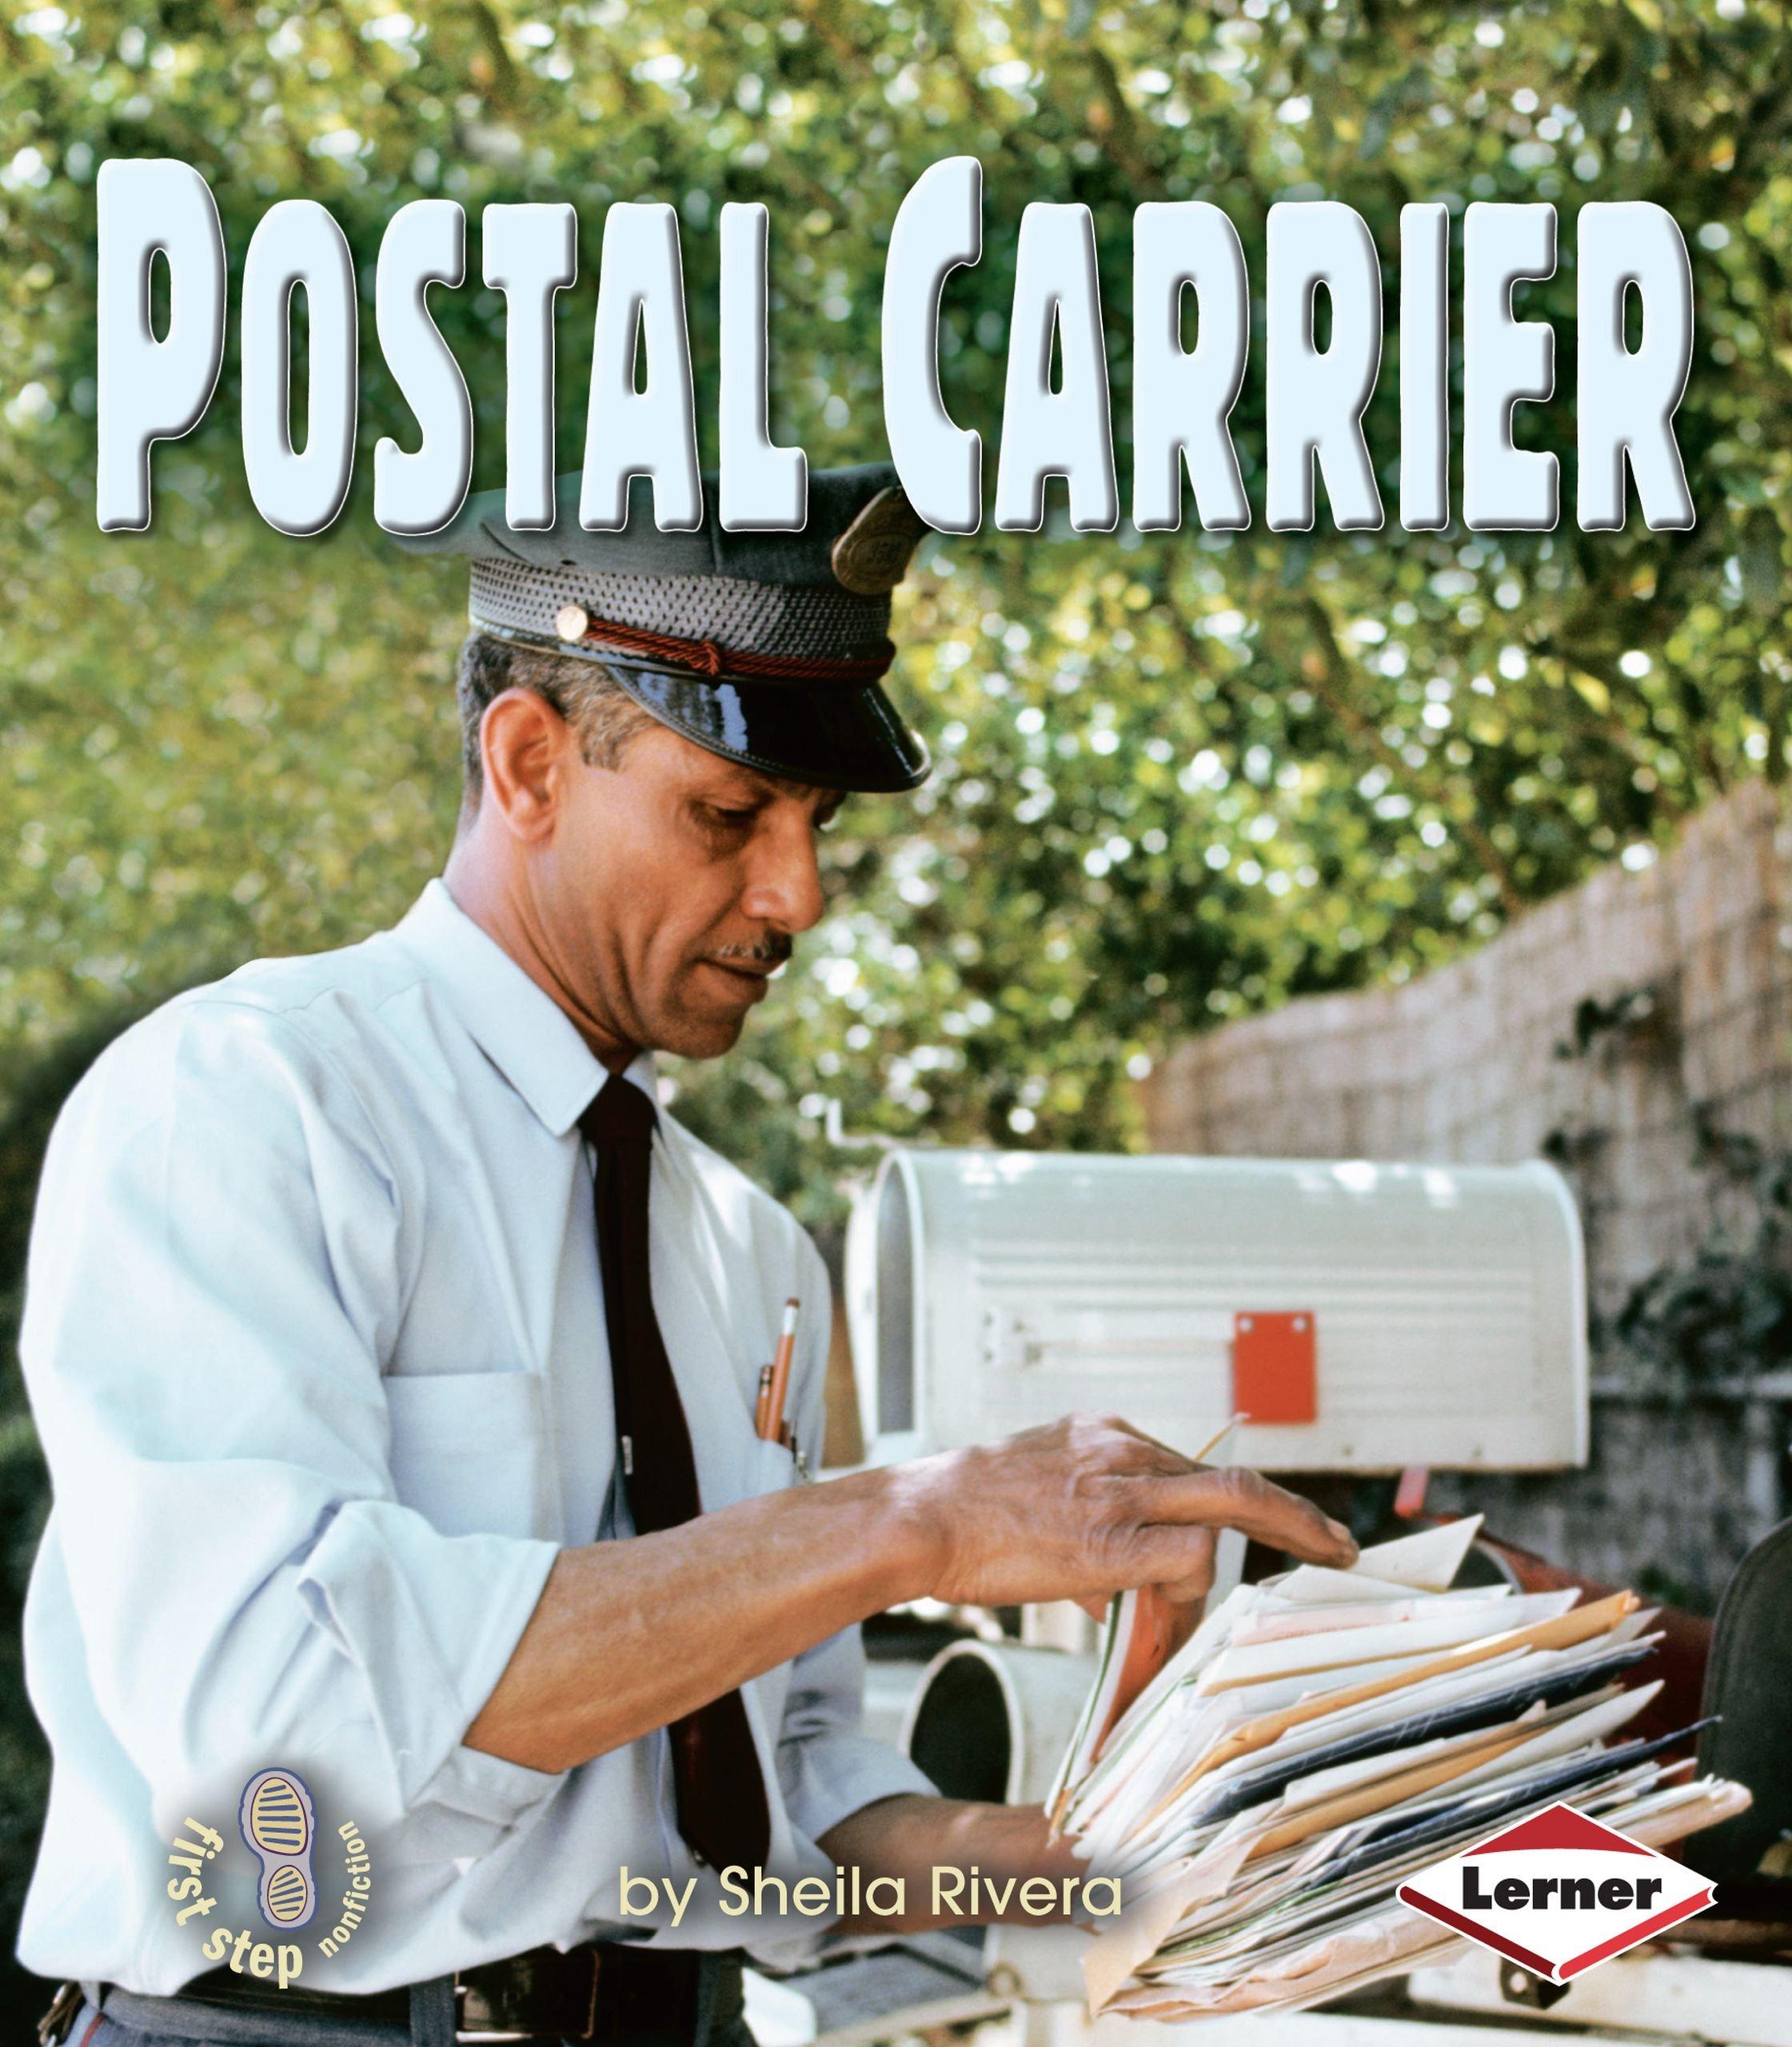 Postal Carrier (First Step Nonfiction) ebook